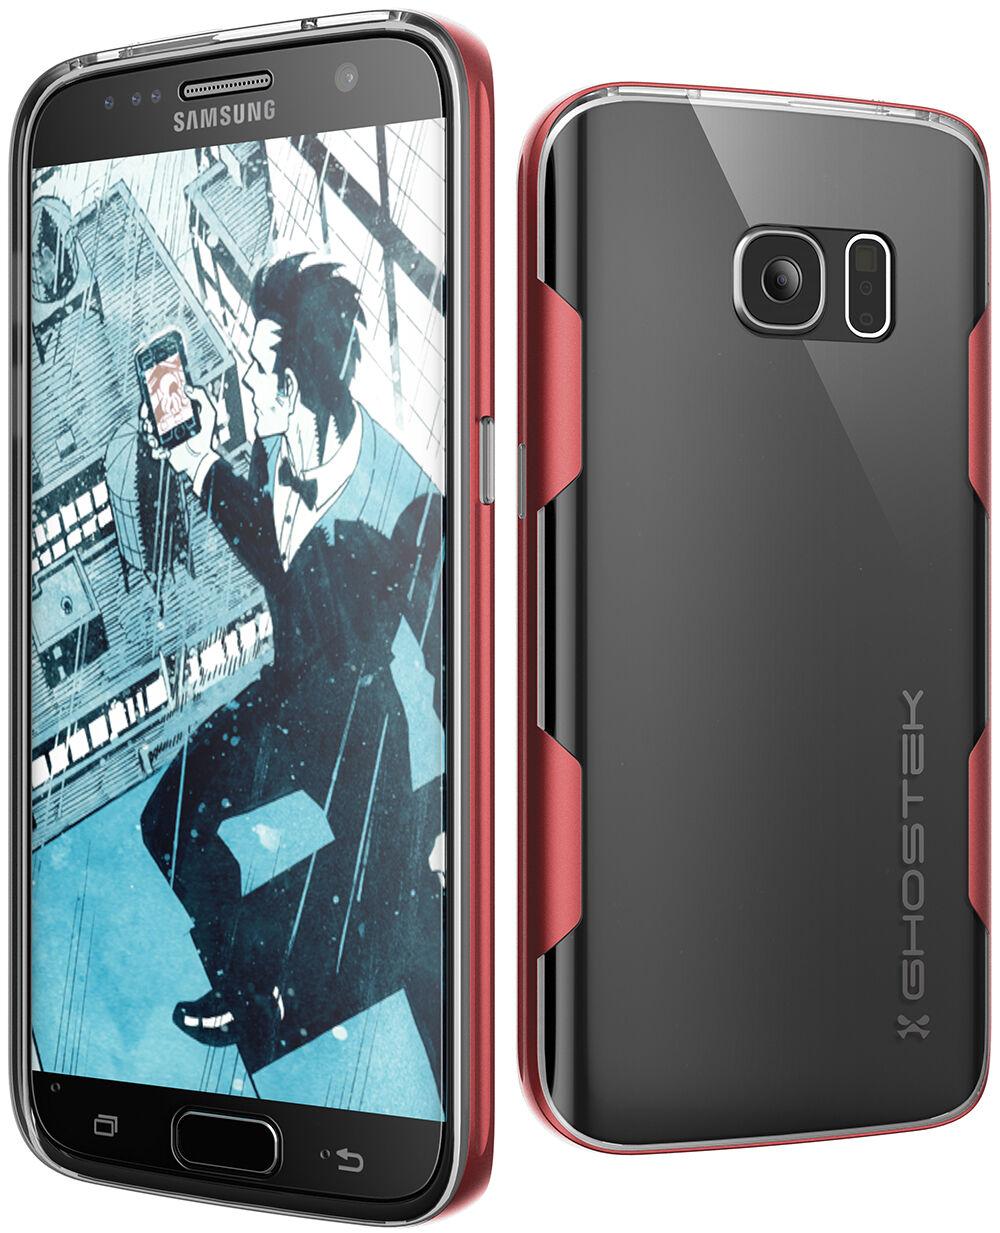 iPhone 5 5s SE 6 6s Galaxy S6 S7 Edge Note 5 LG V10 Case   G